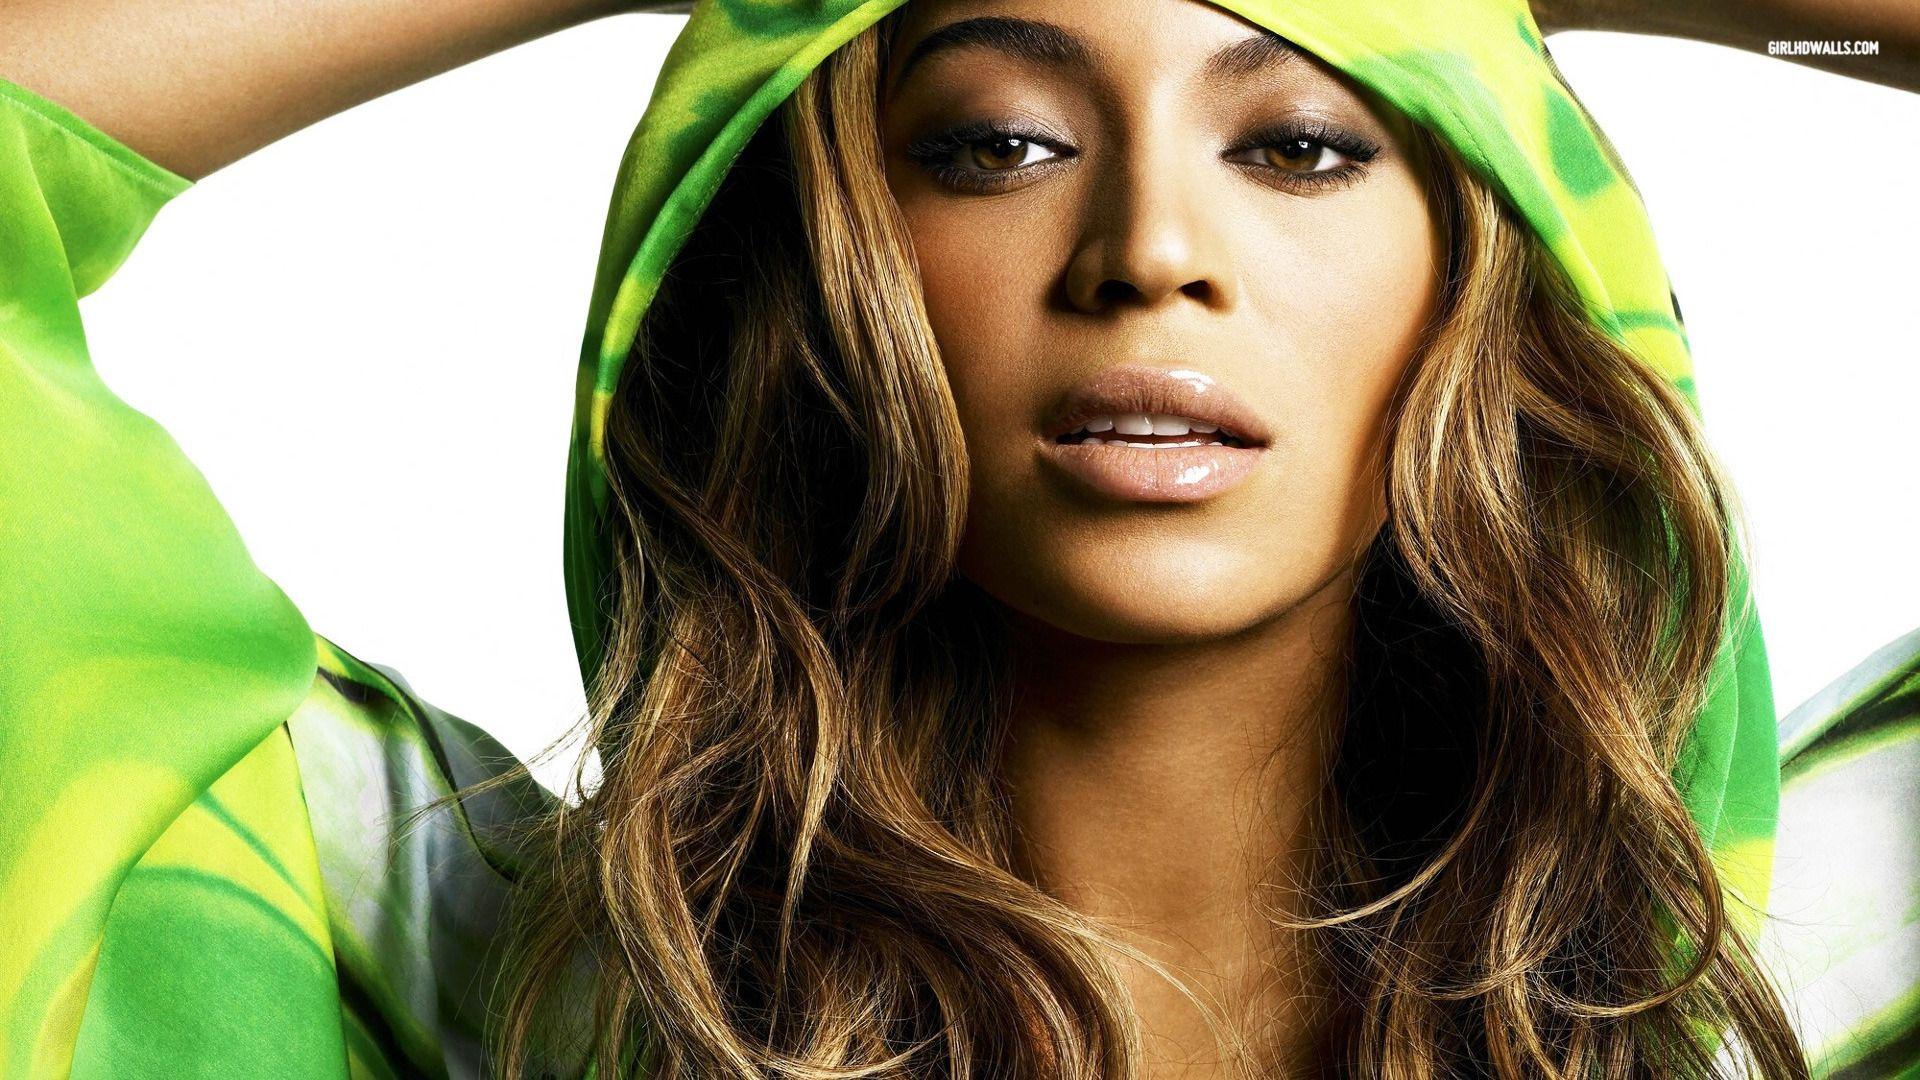 Beyonce Wallpapers HD Download free Beyonce hot hd